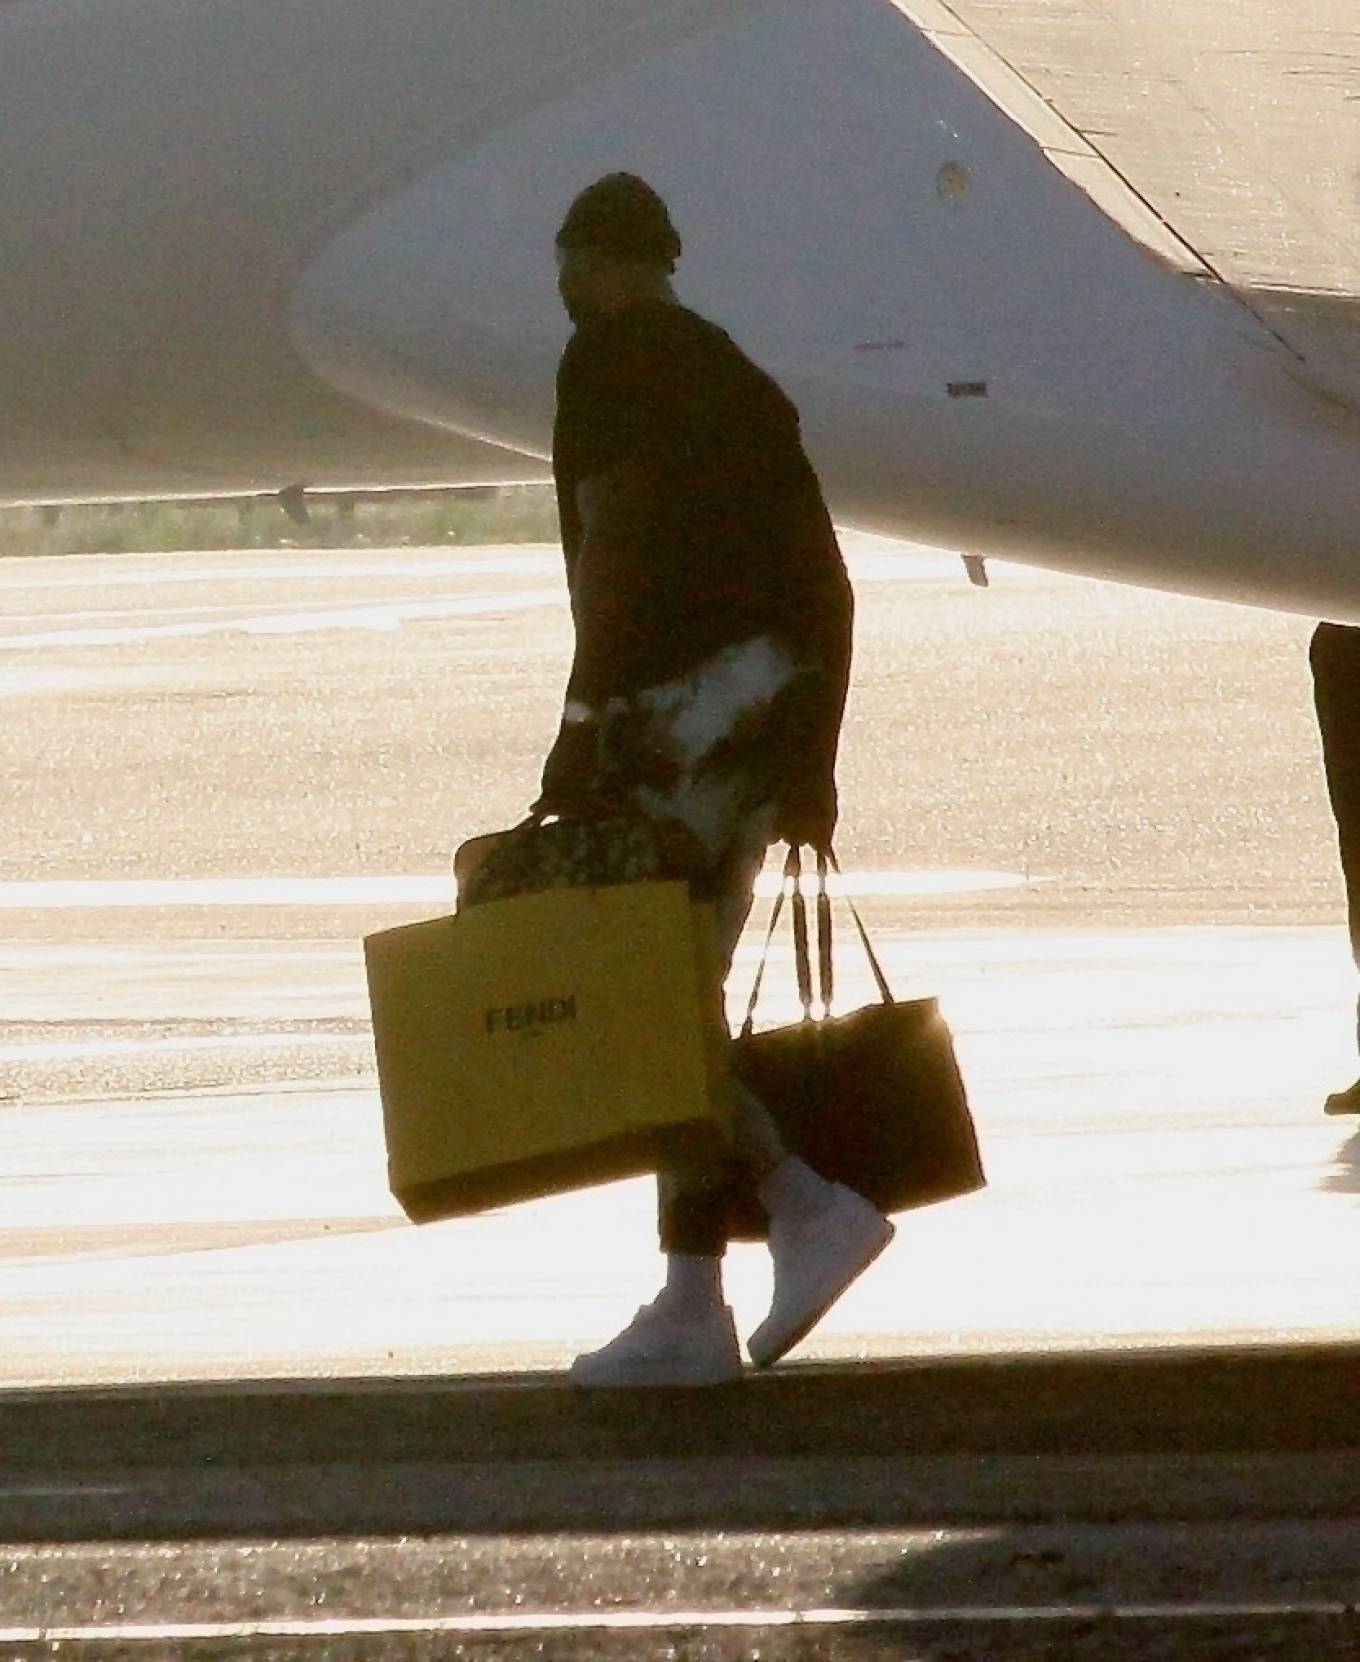 Khloe Kardashian 2020 : Khloe Kardashian and Kourtney Kardashian – Pictured boarding Kylie Jenners private jet in Van Nuys-12